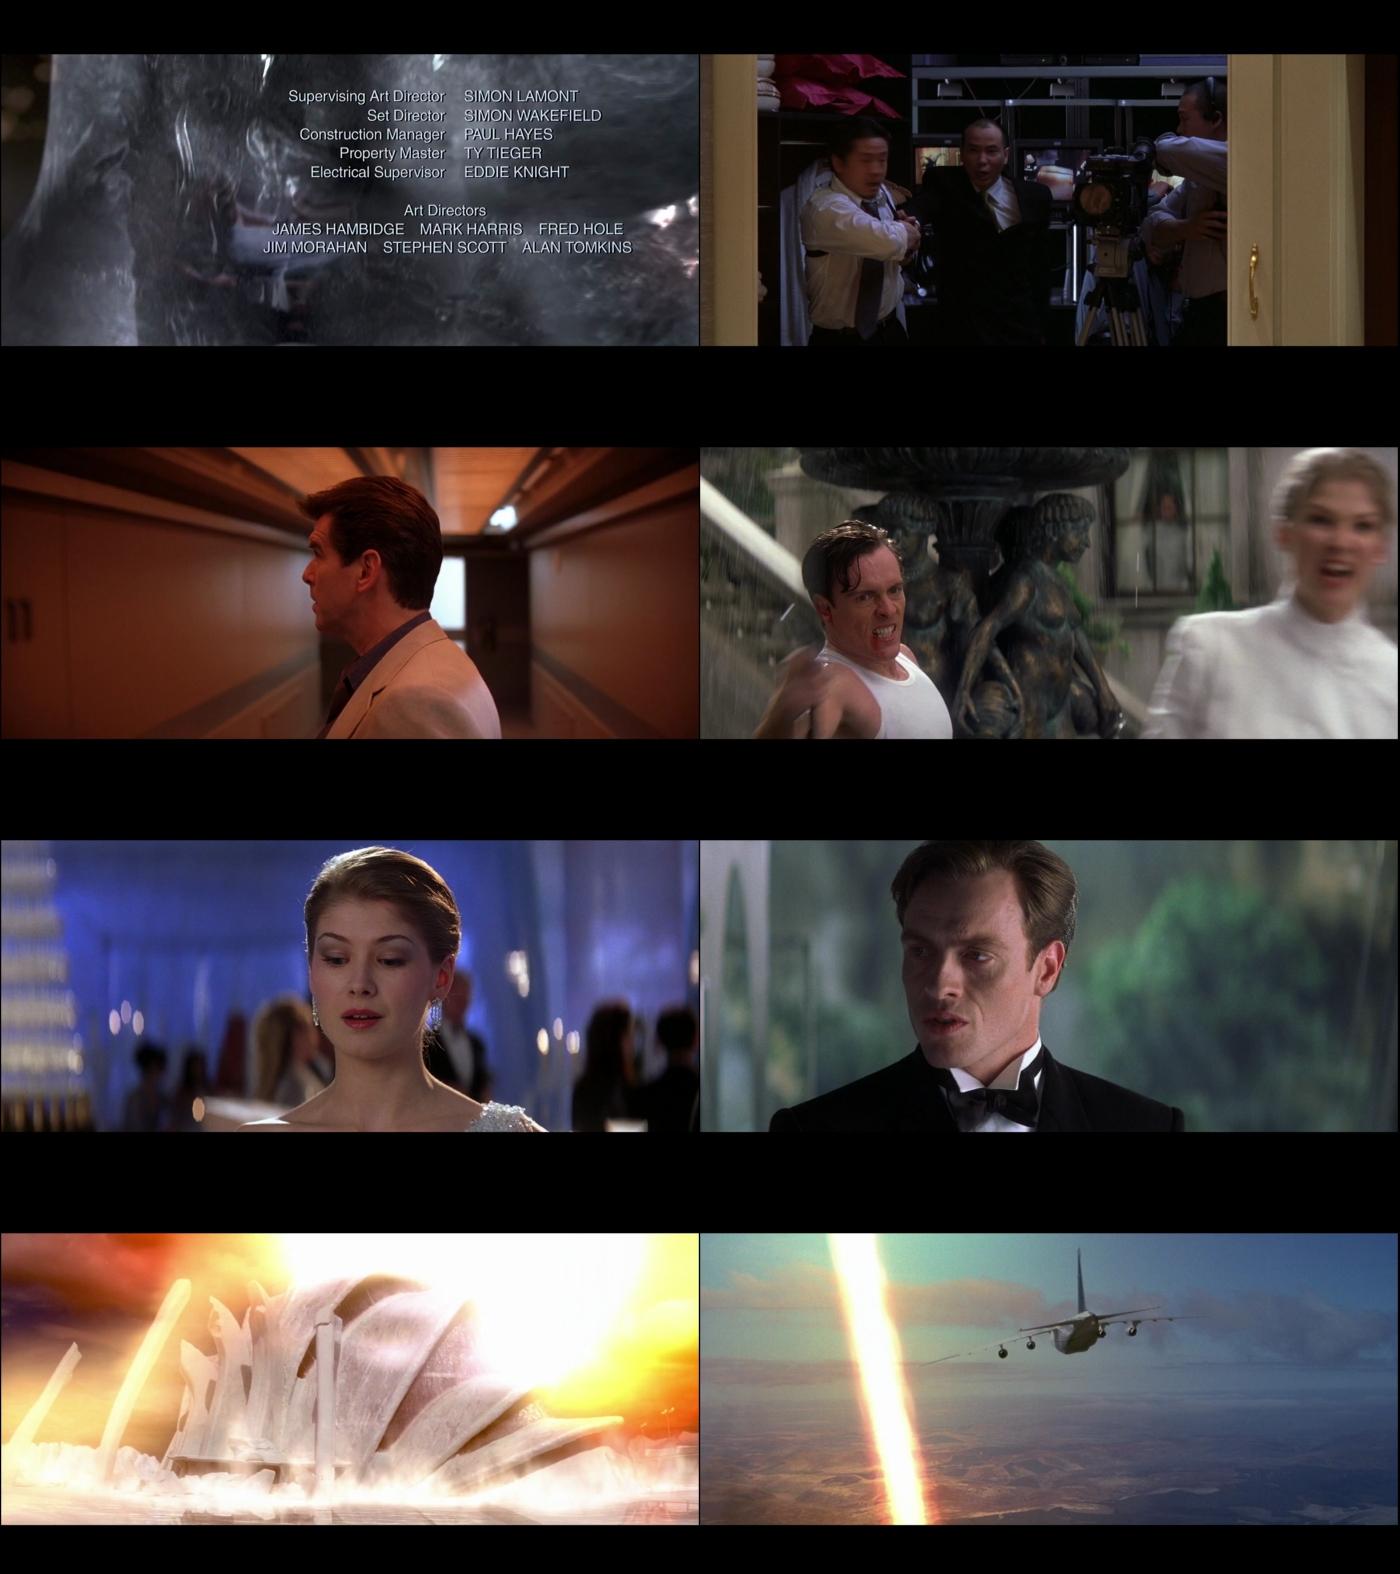 007 Otro dia para morir 1080p Latino